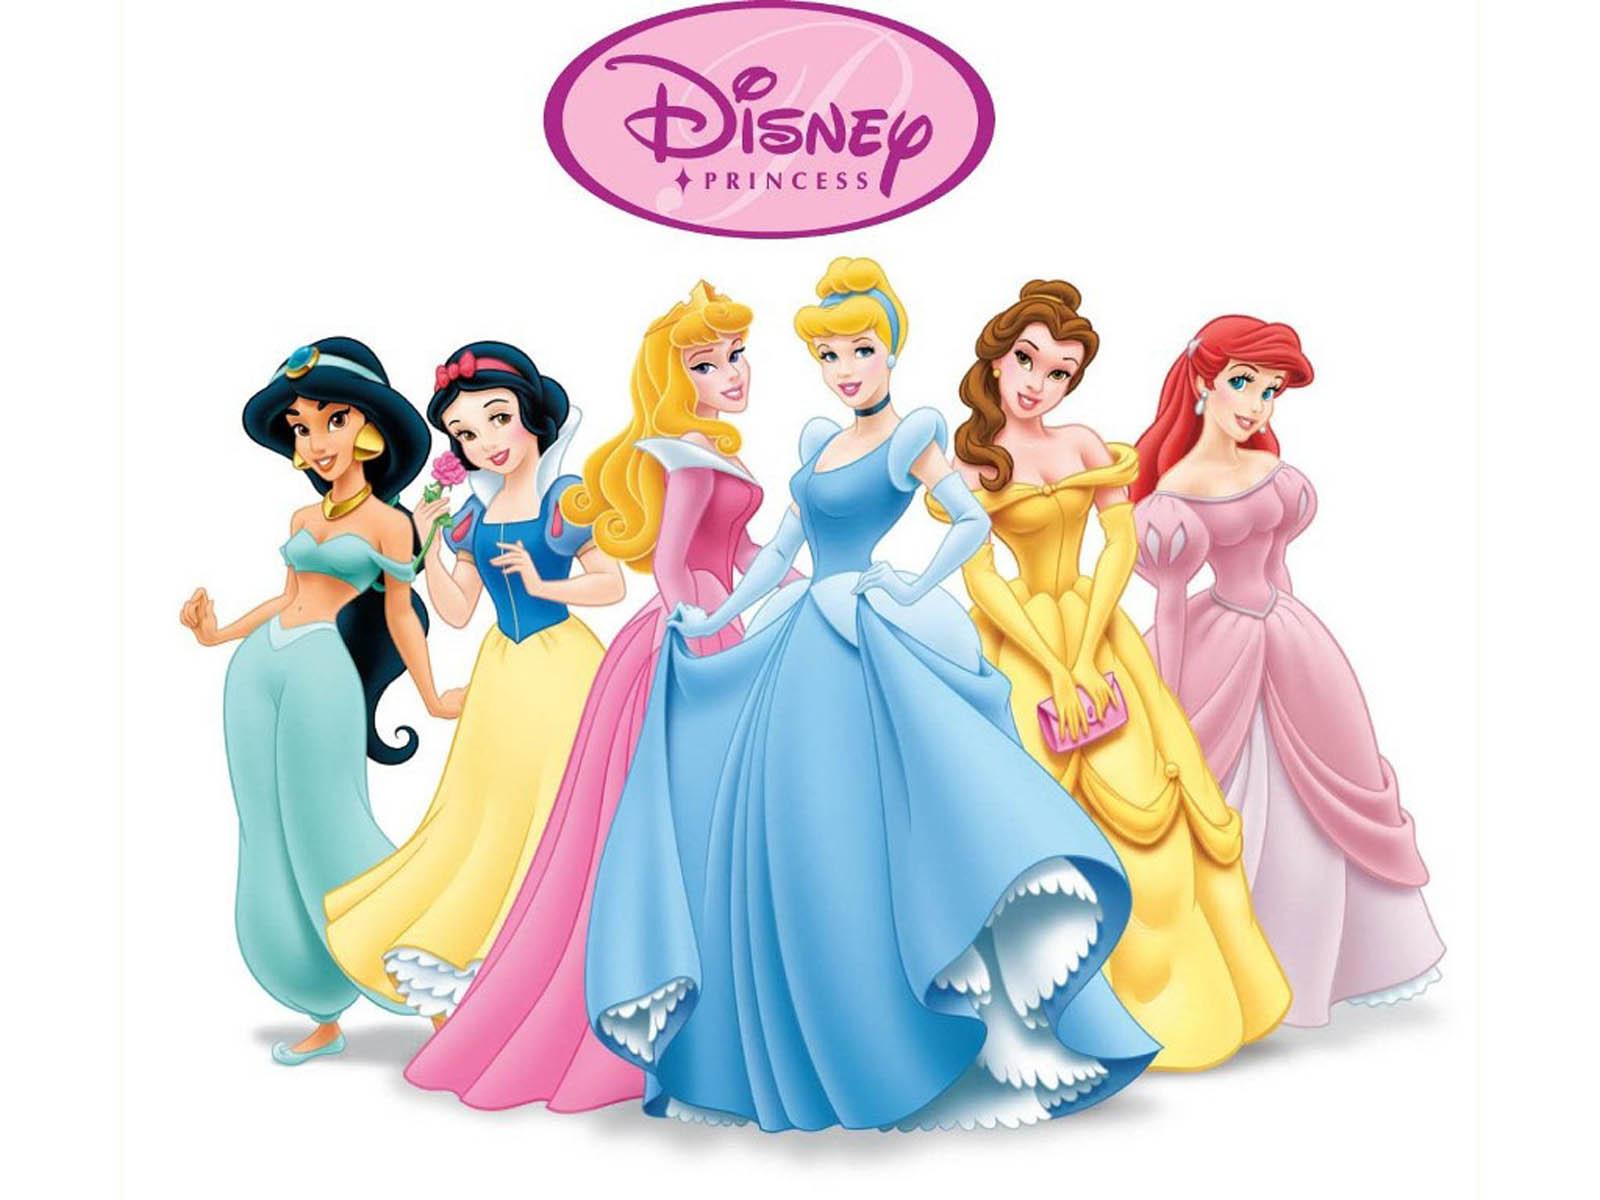 Disney princess karen k lee - Image princesse disney ...